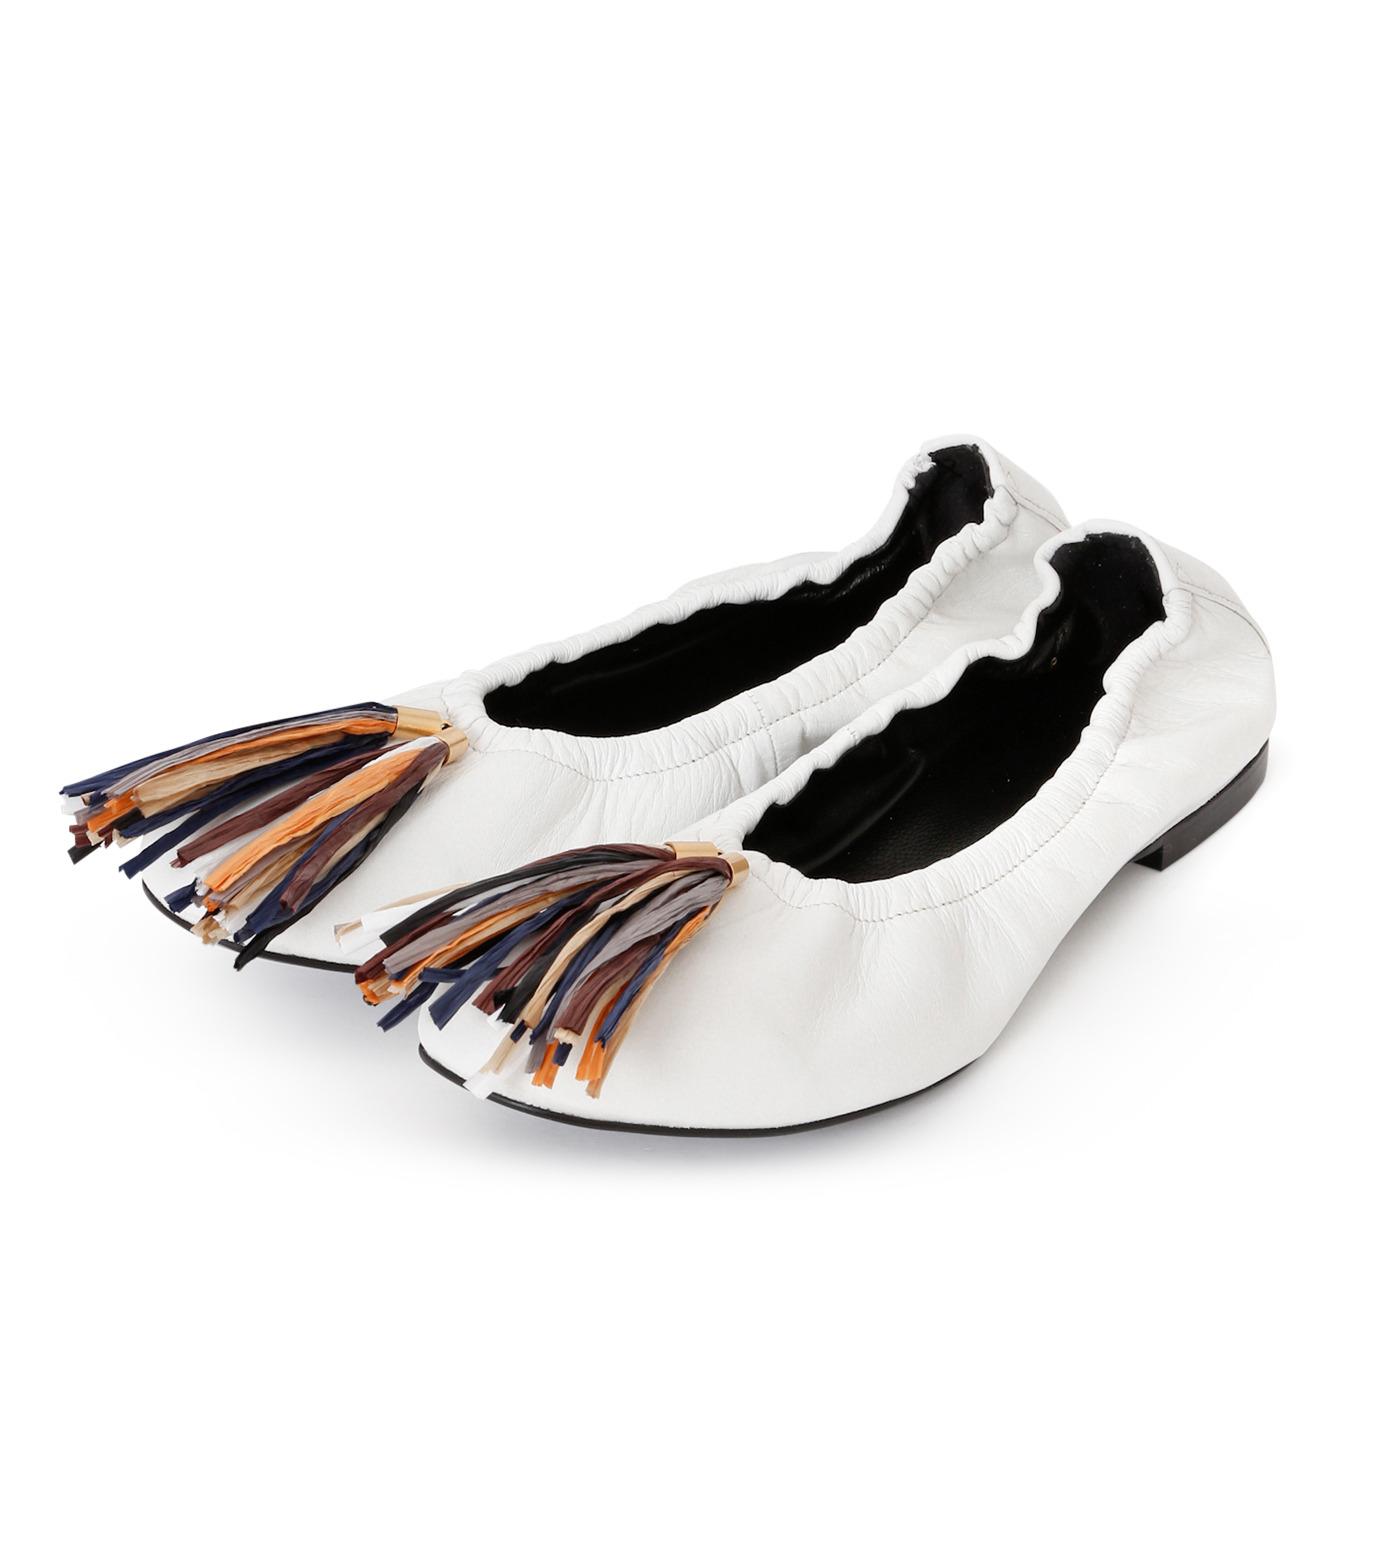 PIPPICHIC(ピッピシック)のballet shoes-WHITE(シューズ/shoes)-PP16BALLET19-4 拡大詳細画像2